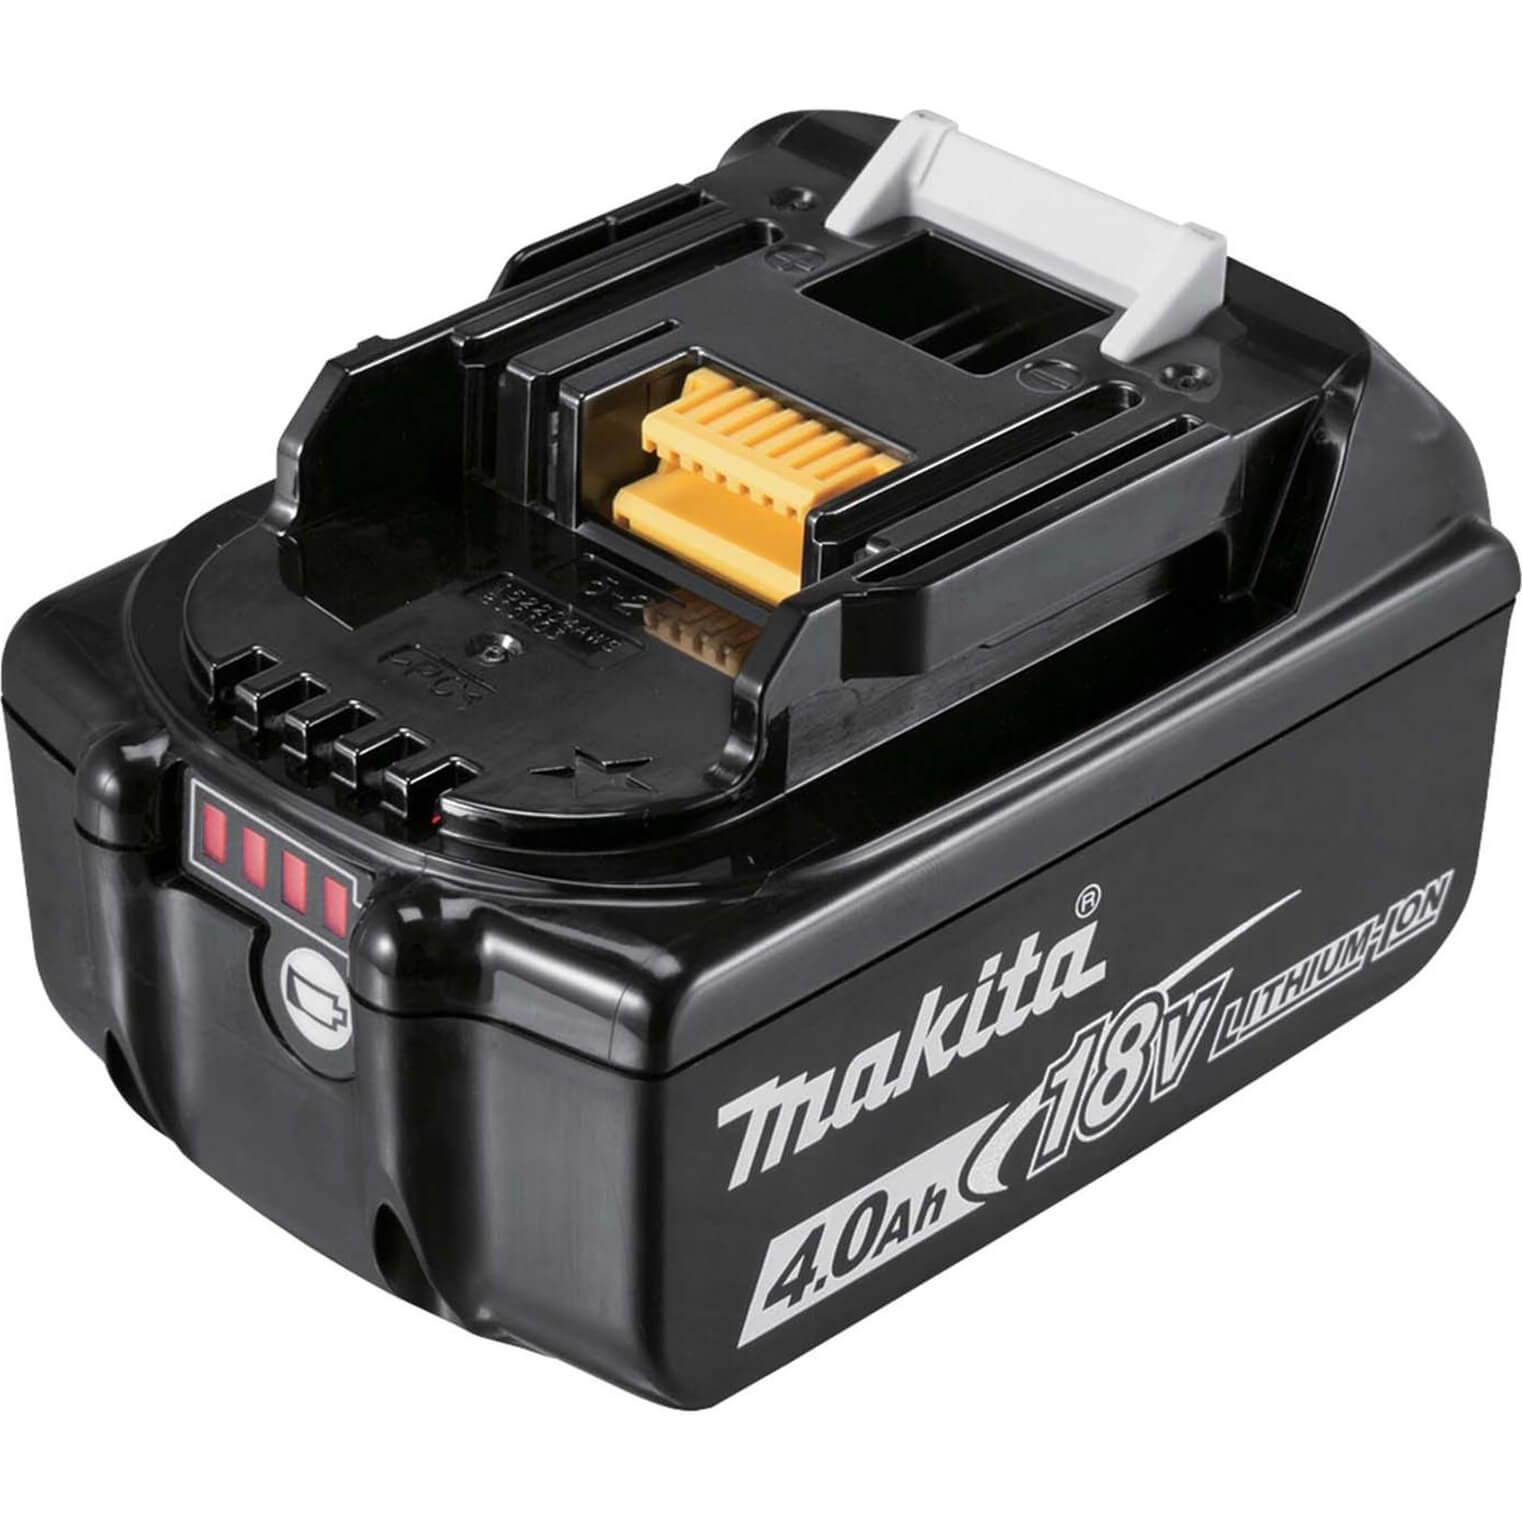 Image of Makita BL1840 18v Cordless Li-ion Battery 4ah 4ah